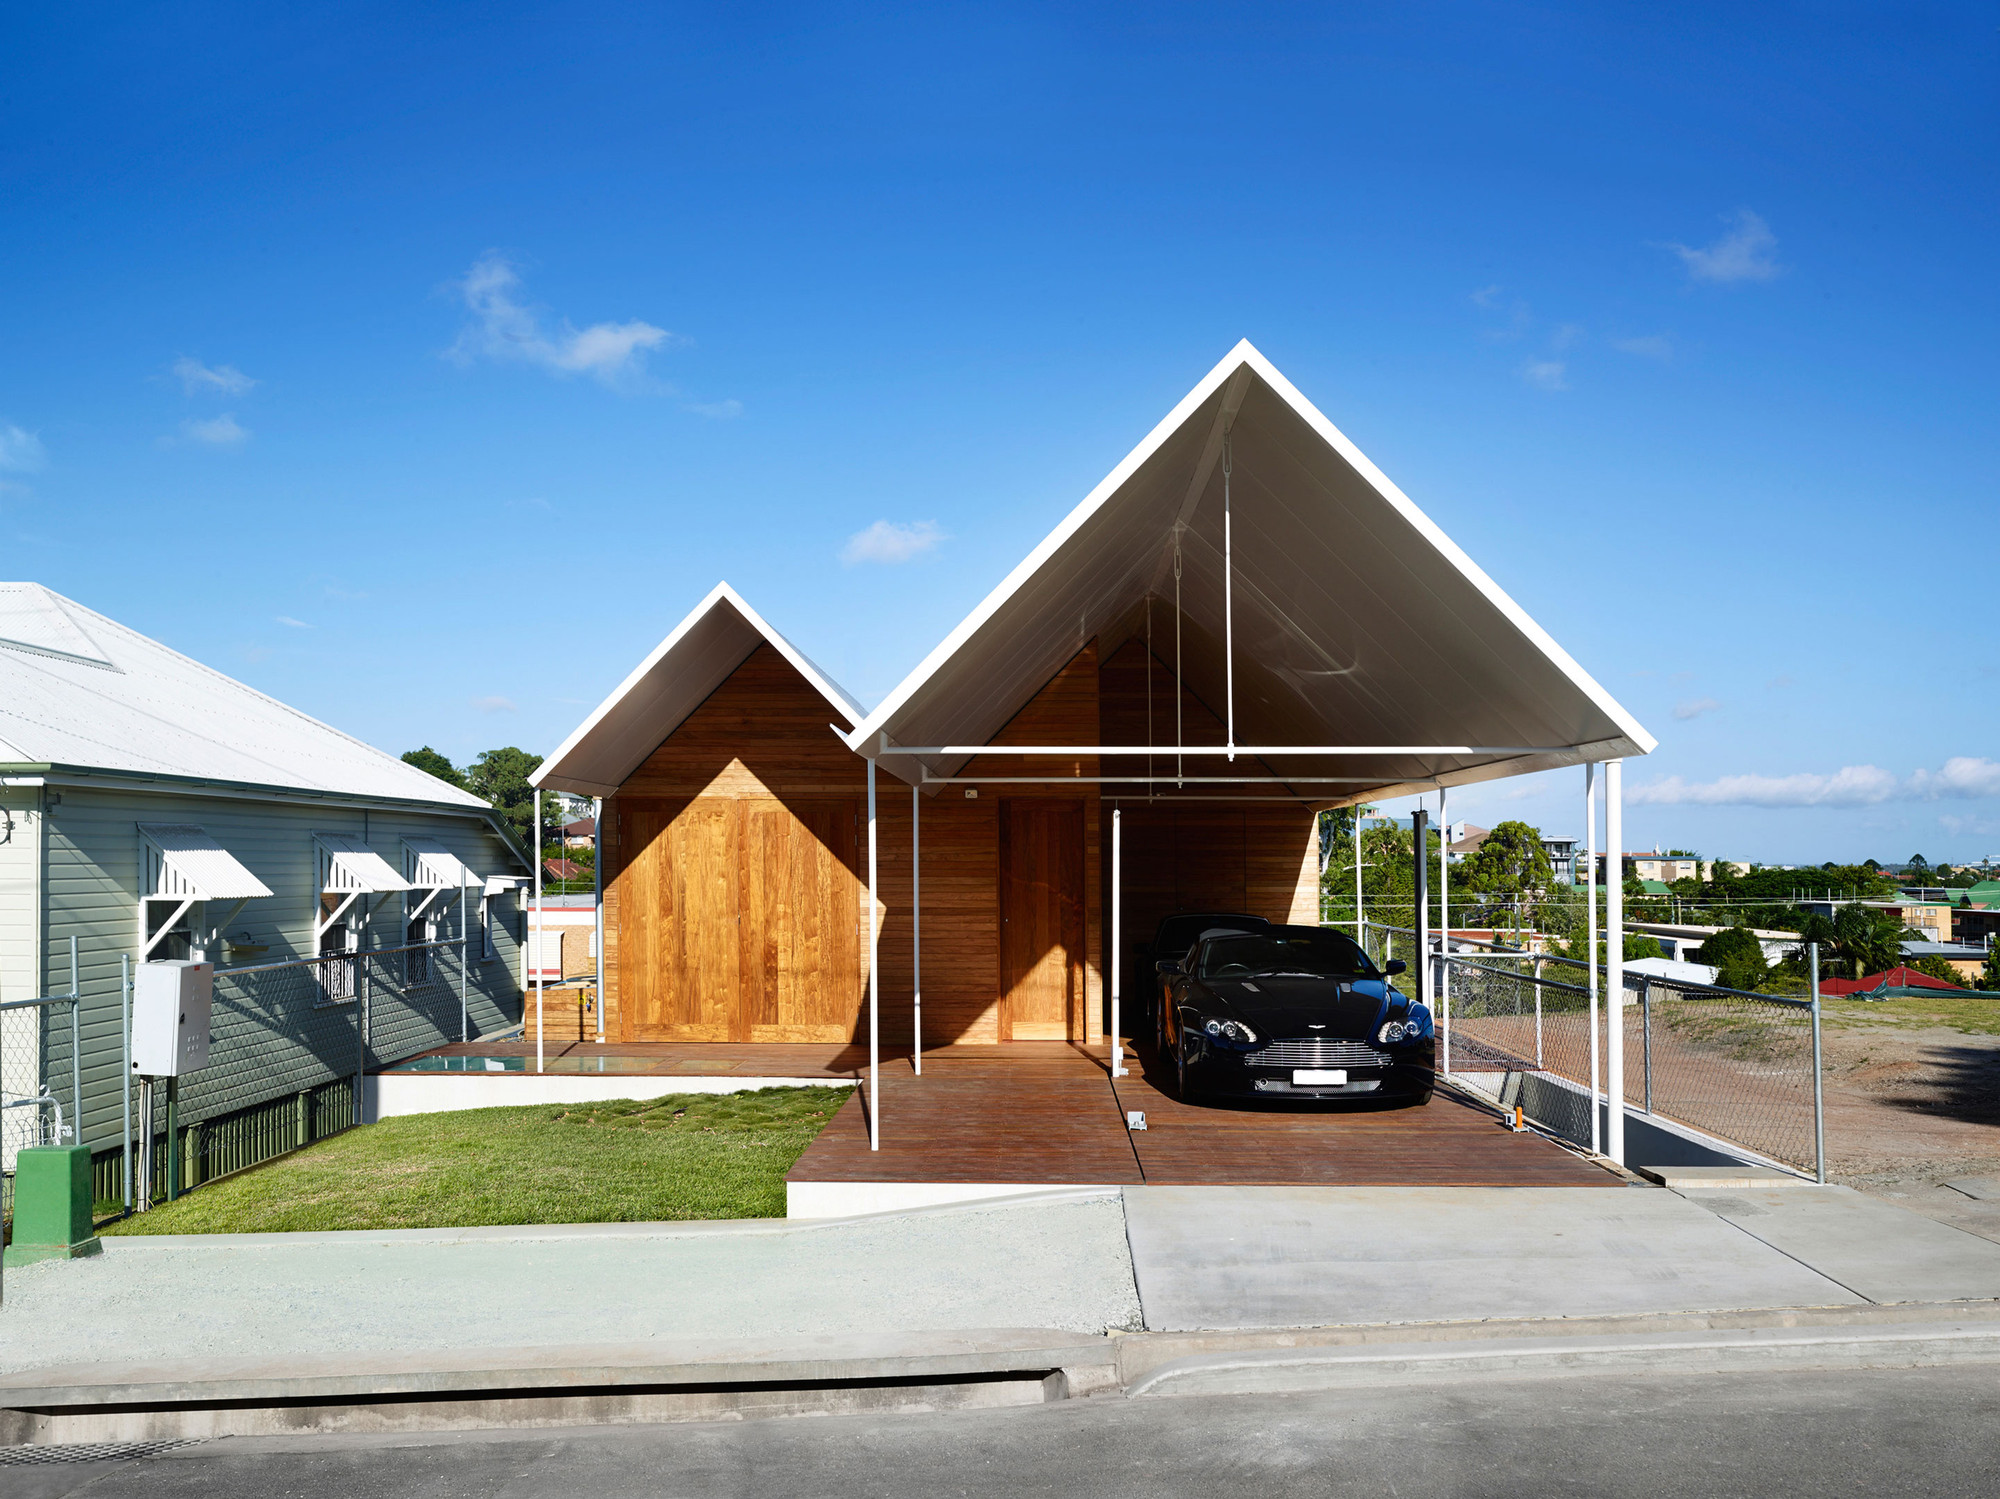 Christian Street House / James Russell Architect, © Toby Scott